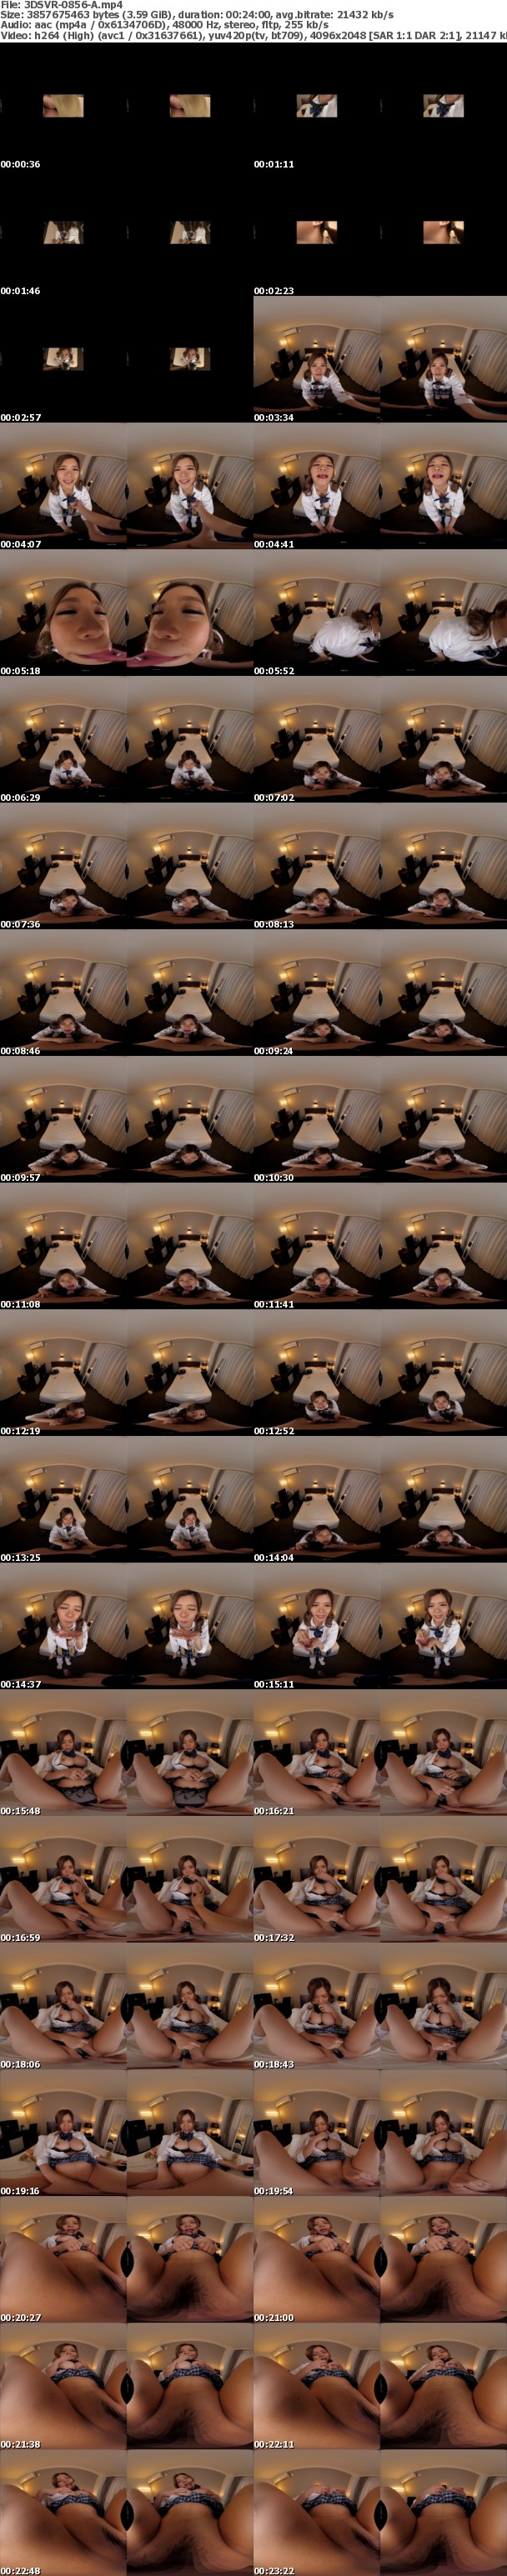 (VR) 3DSVR-0856 【個撮】DMして釣れた舌ピ神対応ムチムチエロギャル 意外とウブでチ○ポ生ハメされて痙攣イキ ナツ